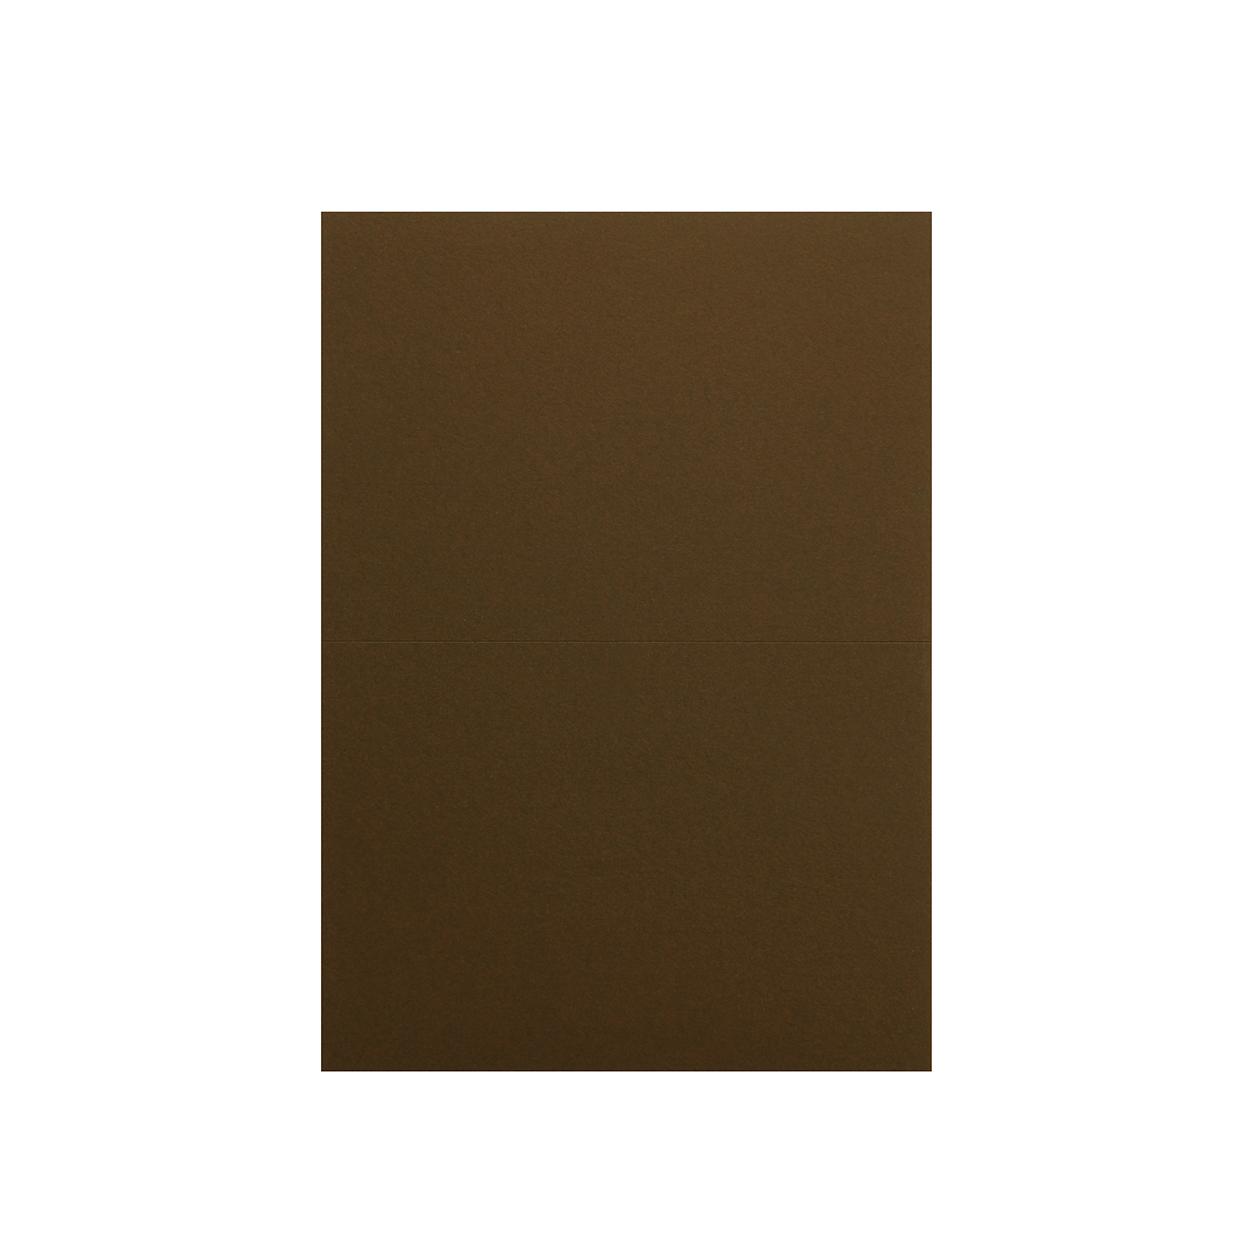 A5カバー コットン チョコレート 291g